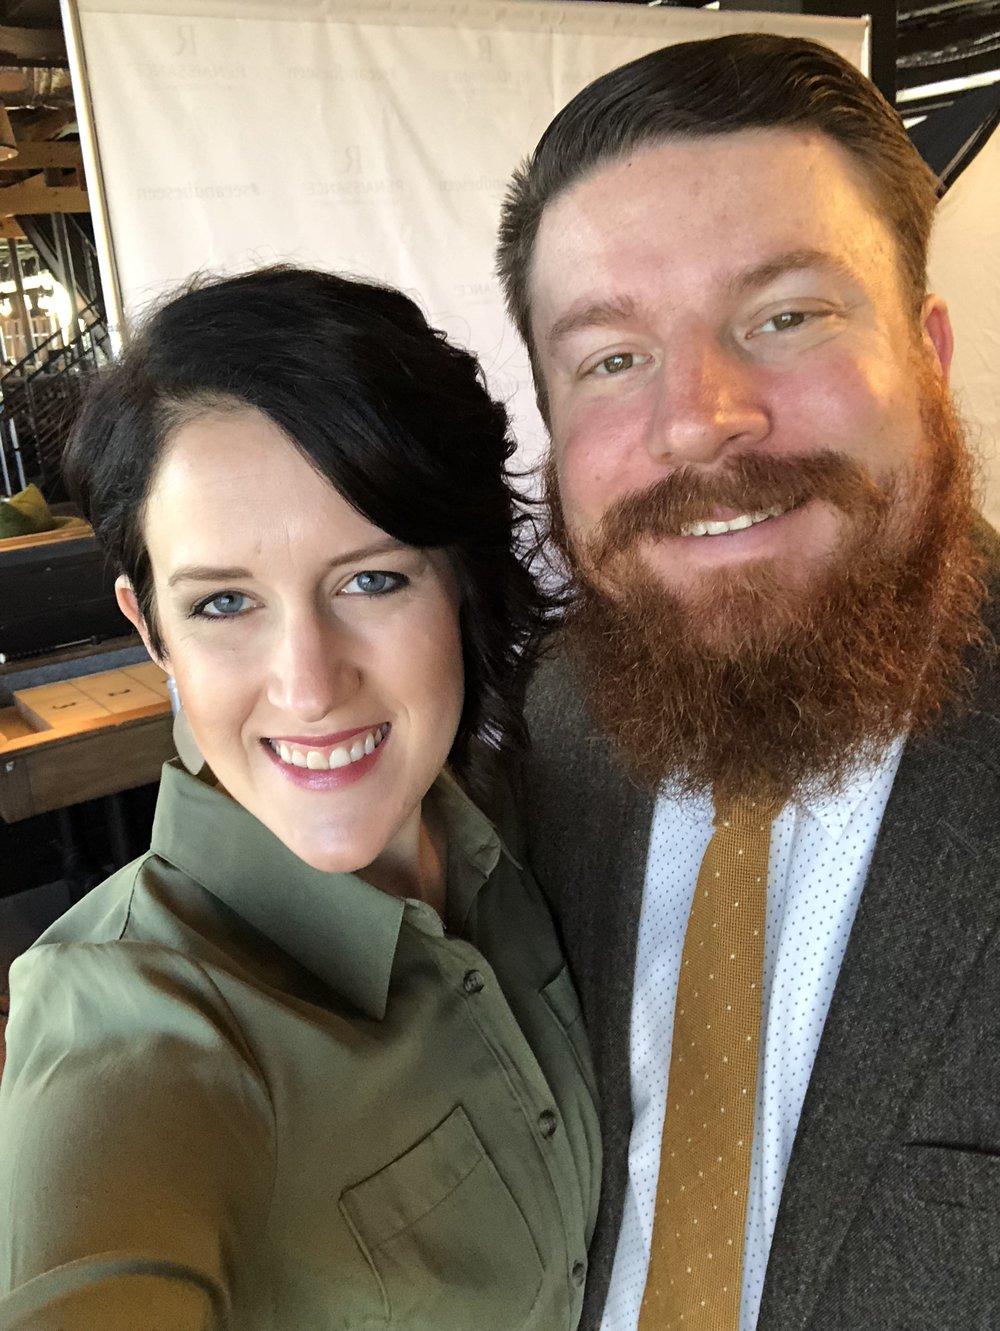 Wedding Photographers from Toledo Ohio at Destination Wedding